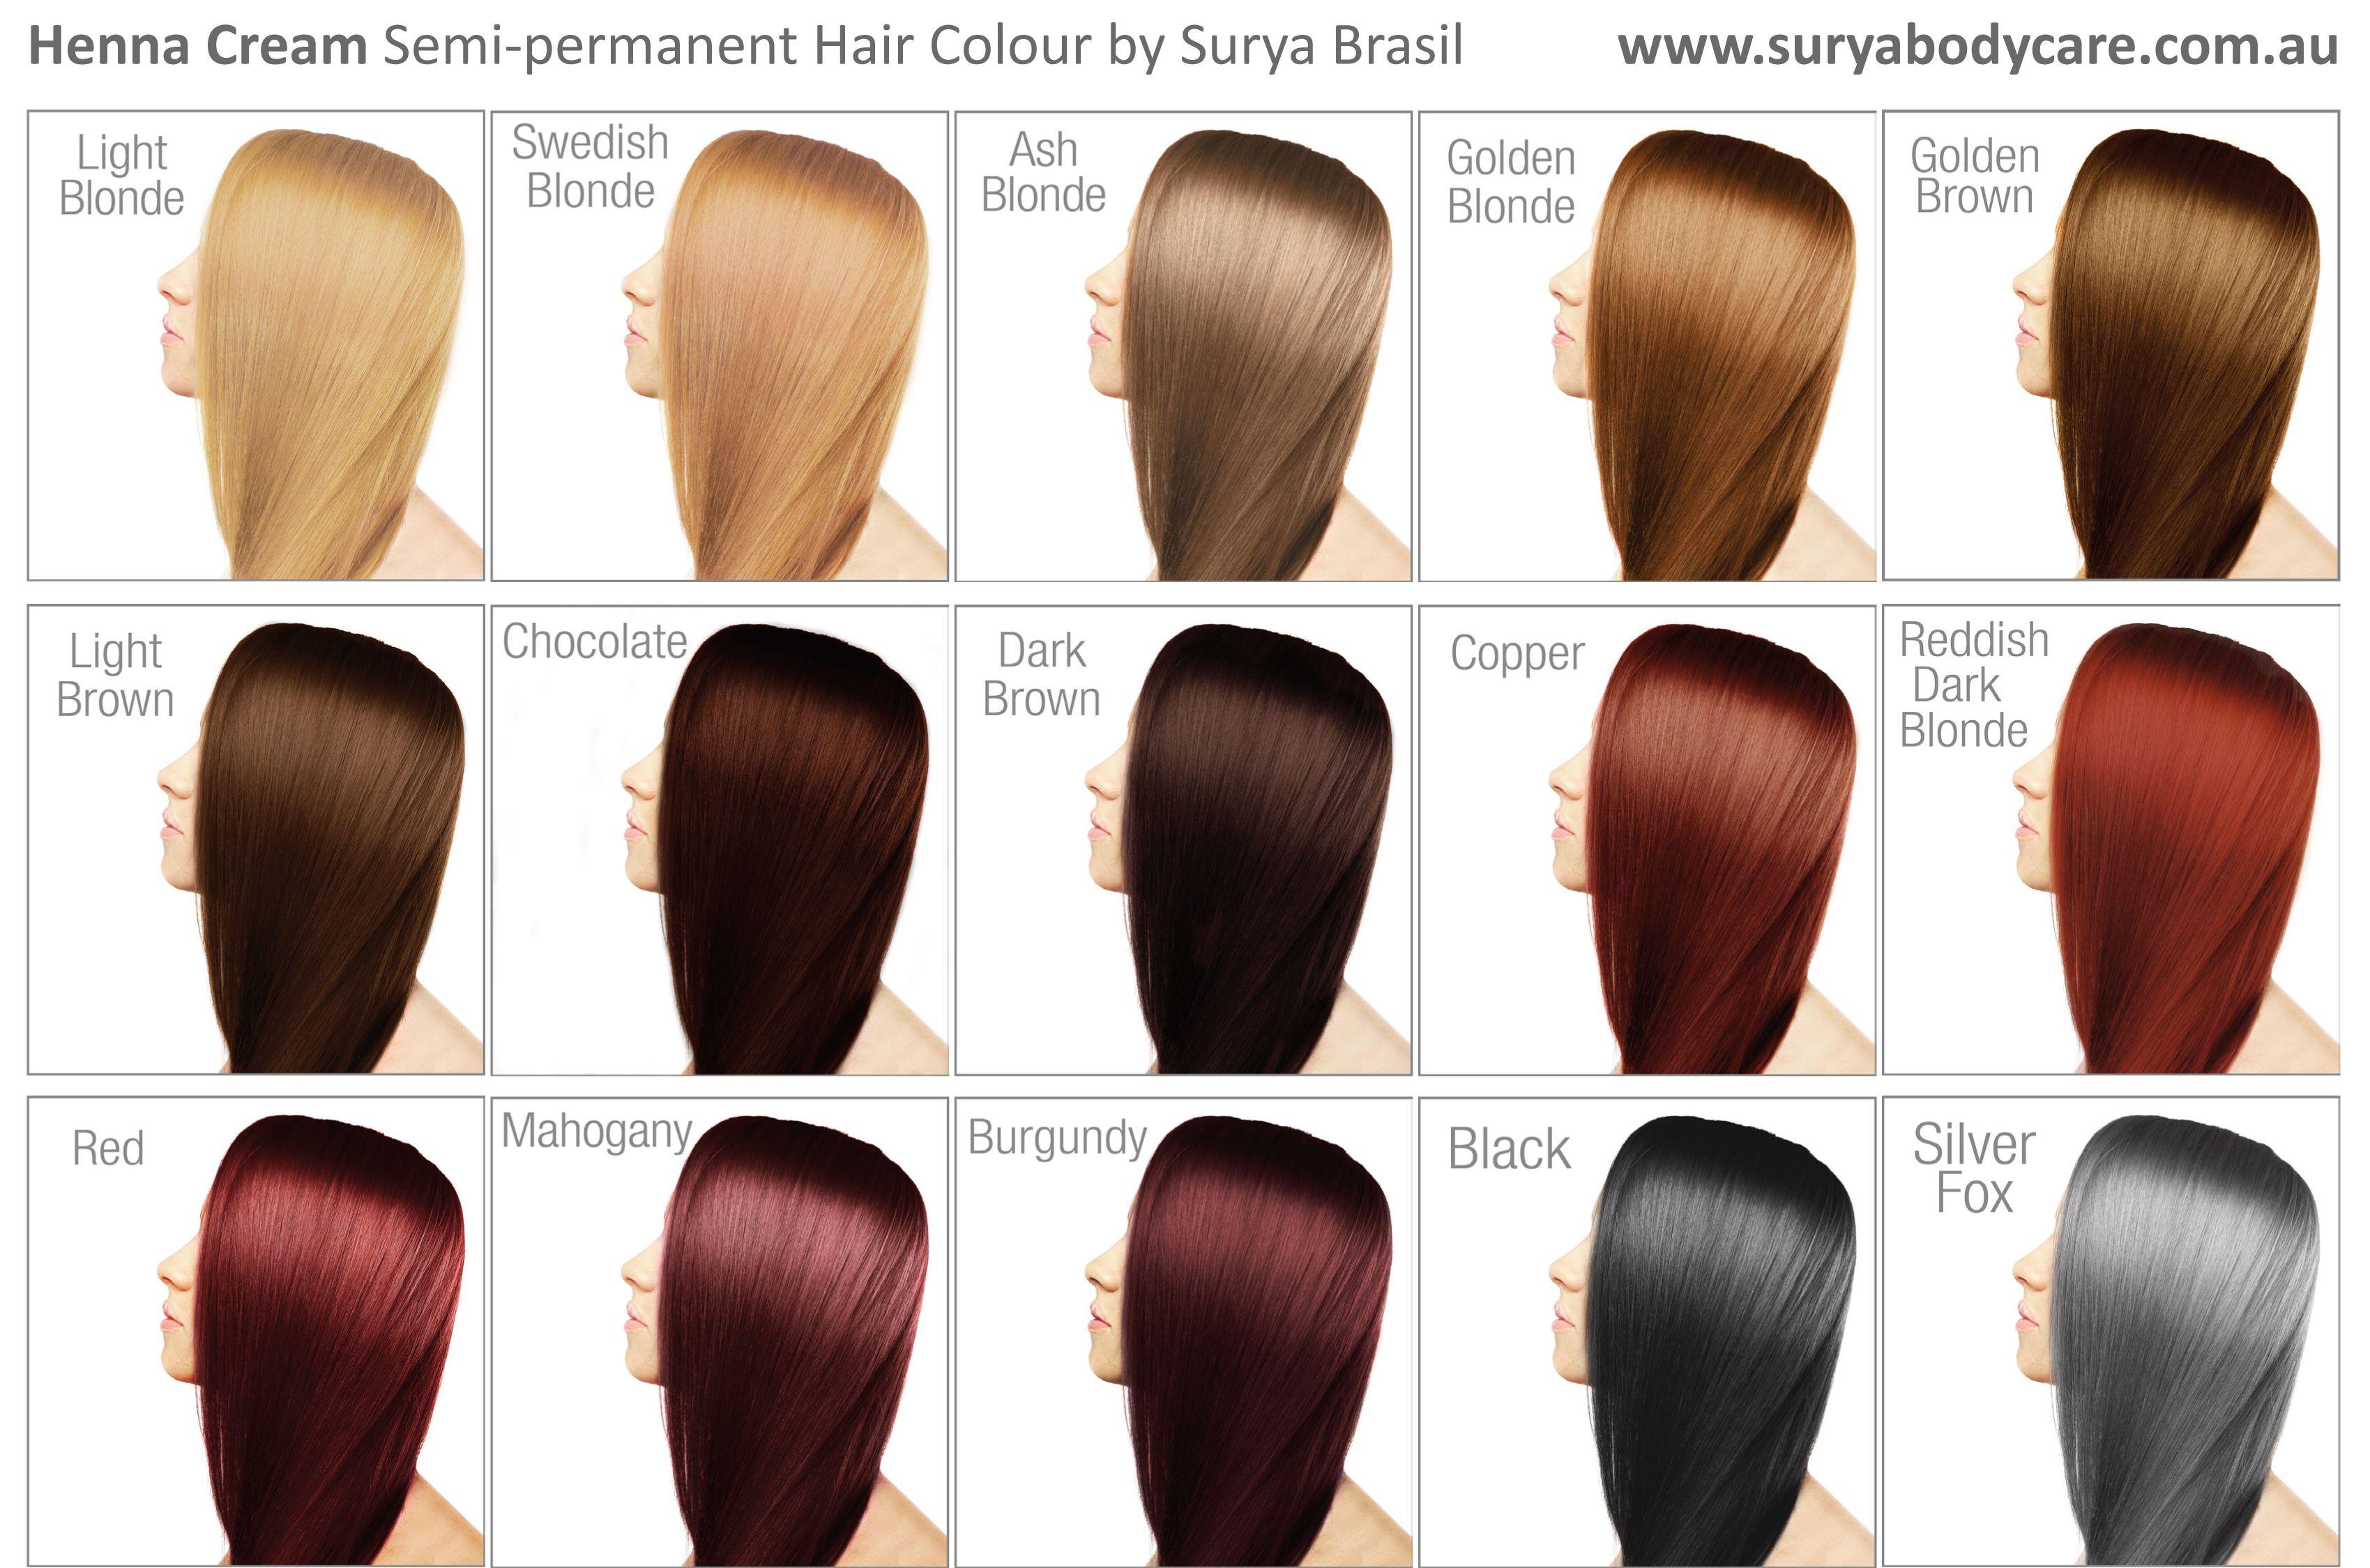 Surya Henna Cream Shade Chart Lrgr Jpg 3399 2249 Brown Hair Color Chart Hair Color Chart Hair Color Shades